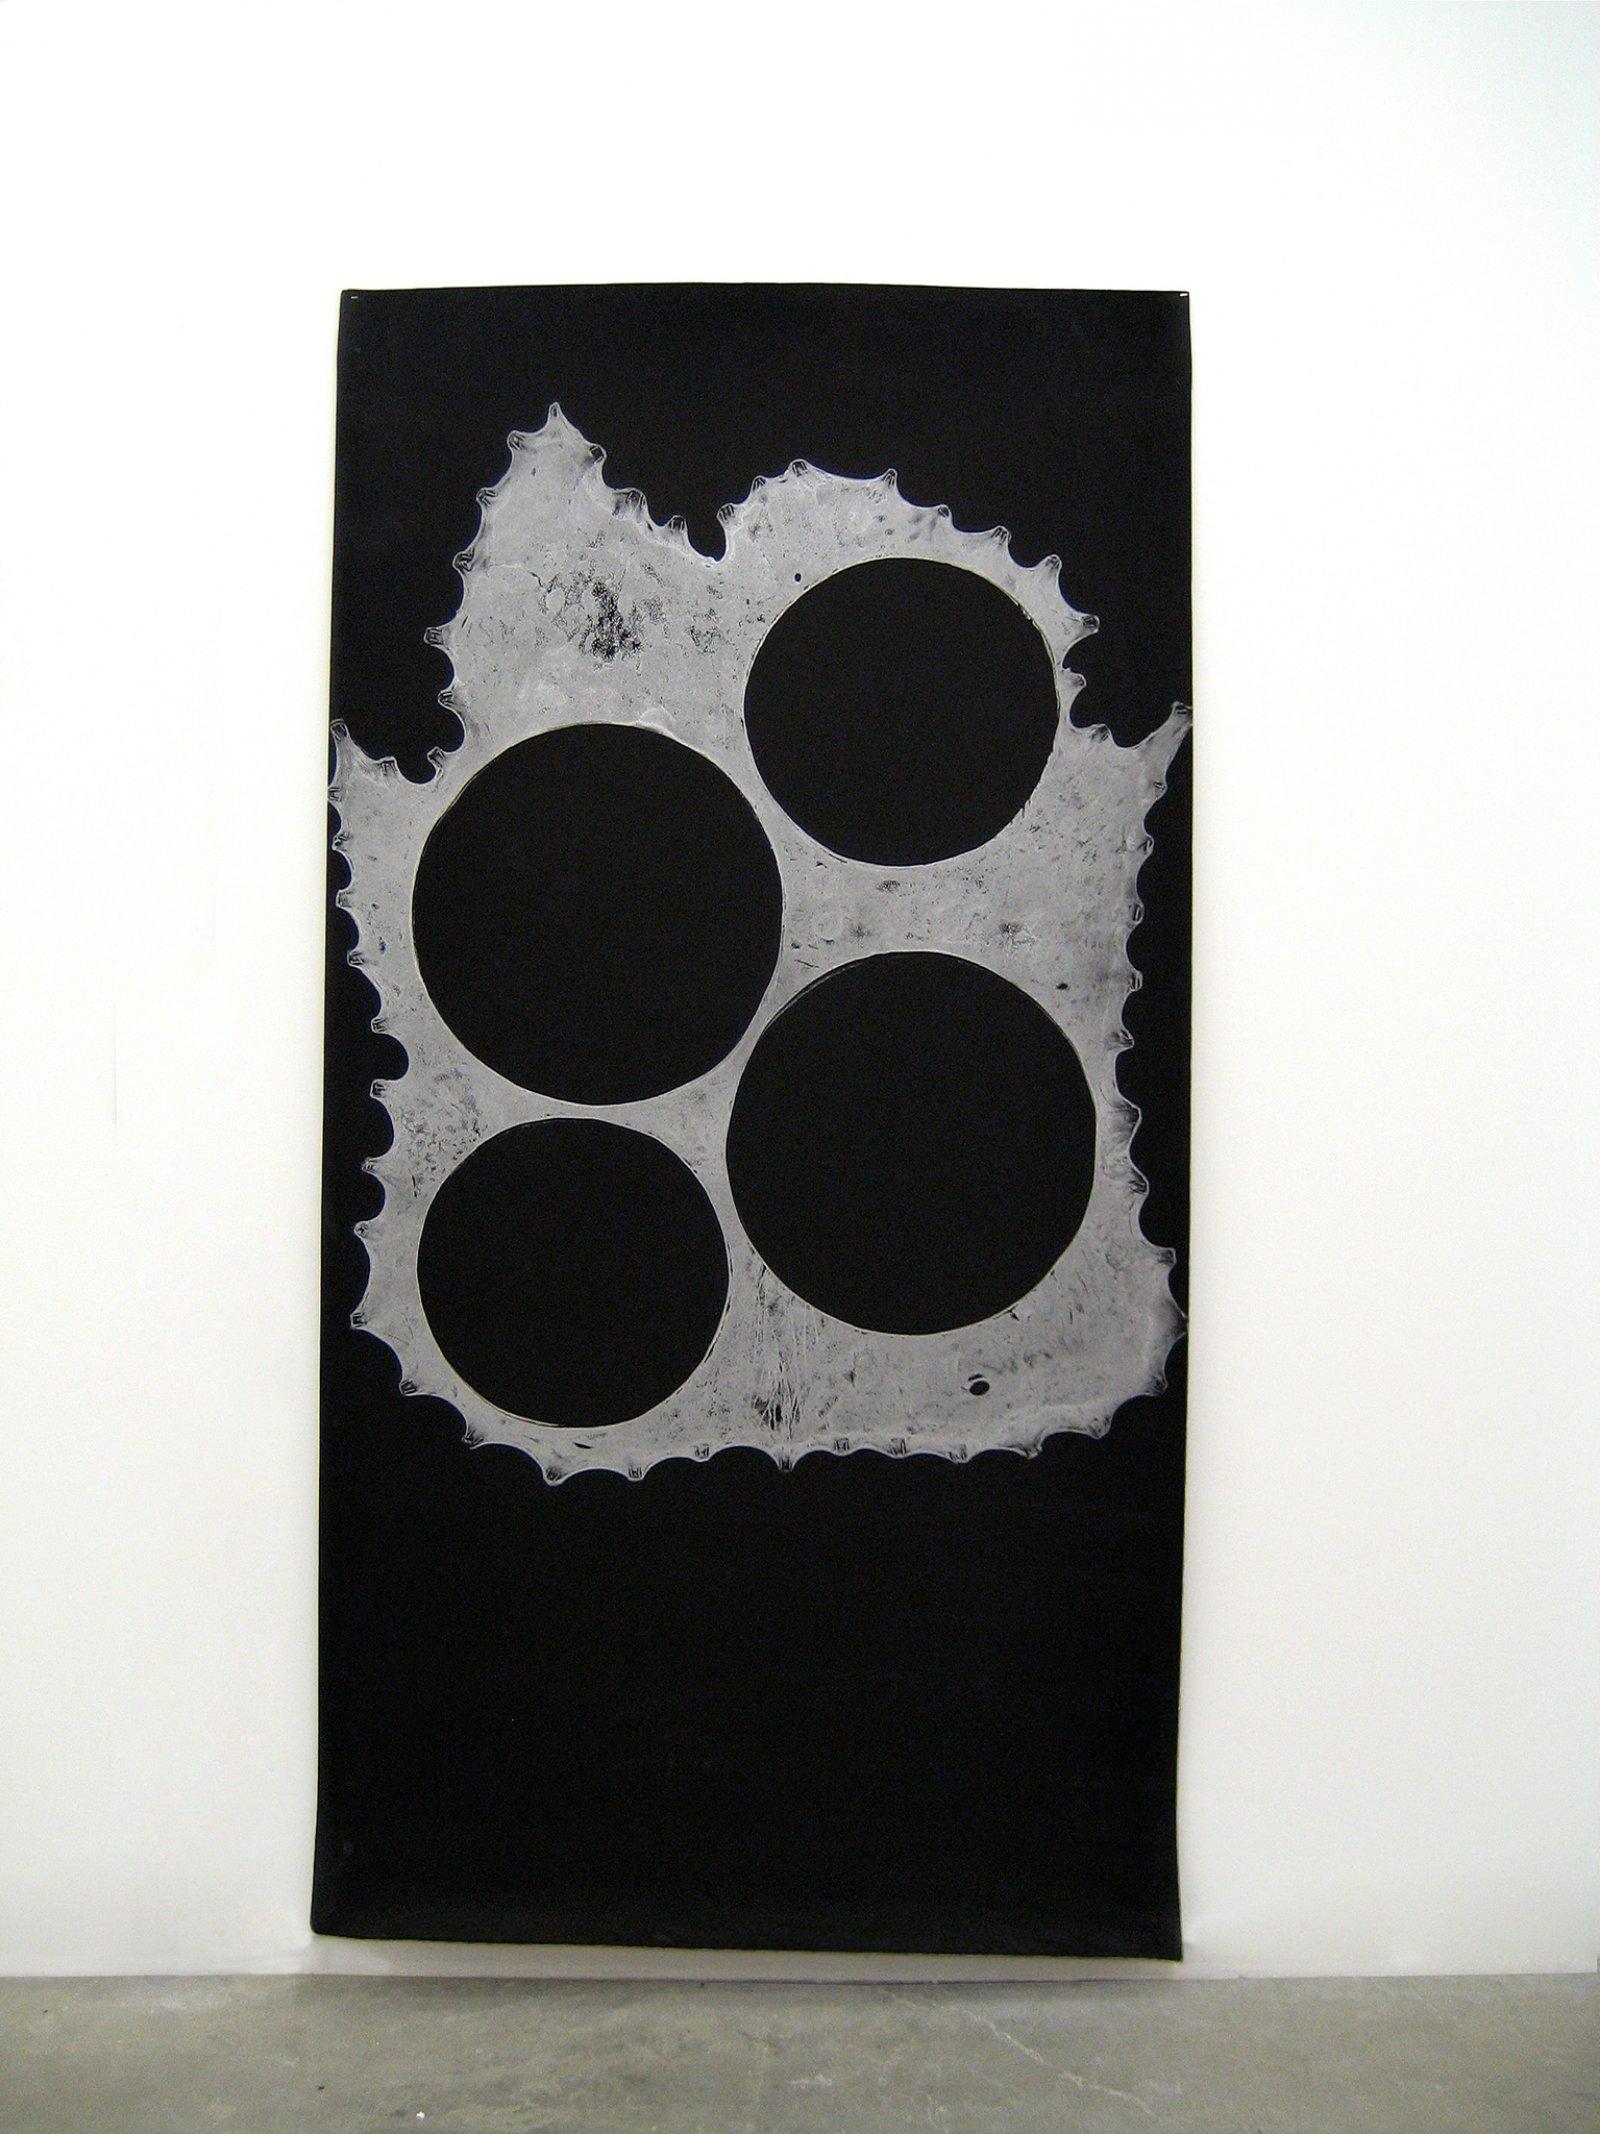 Brian Jungen,Untitled Monoprint, 2011, foam, silver relief ink, 79 x 41 in. (201 x 104 cm)